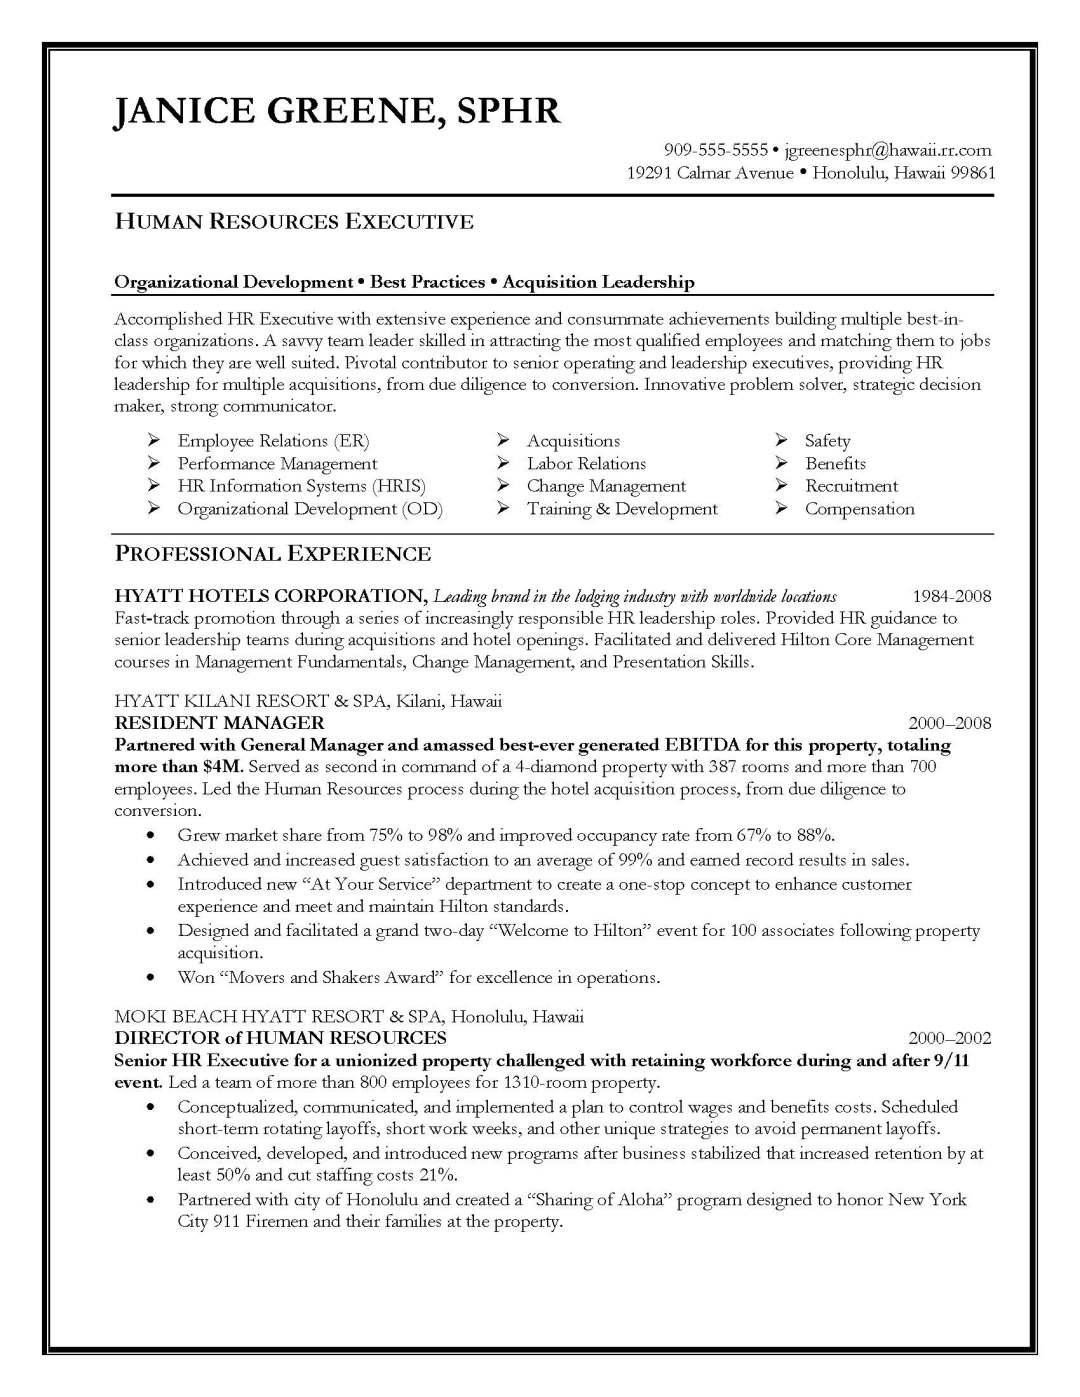 Executive resume writing service nyc